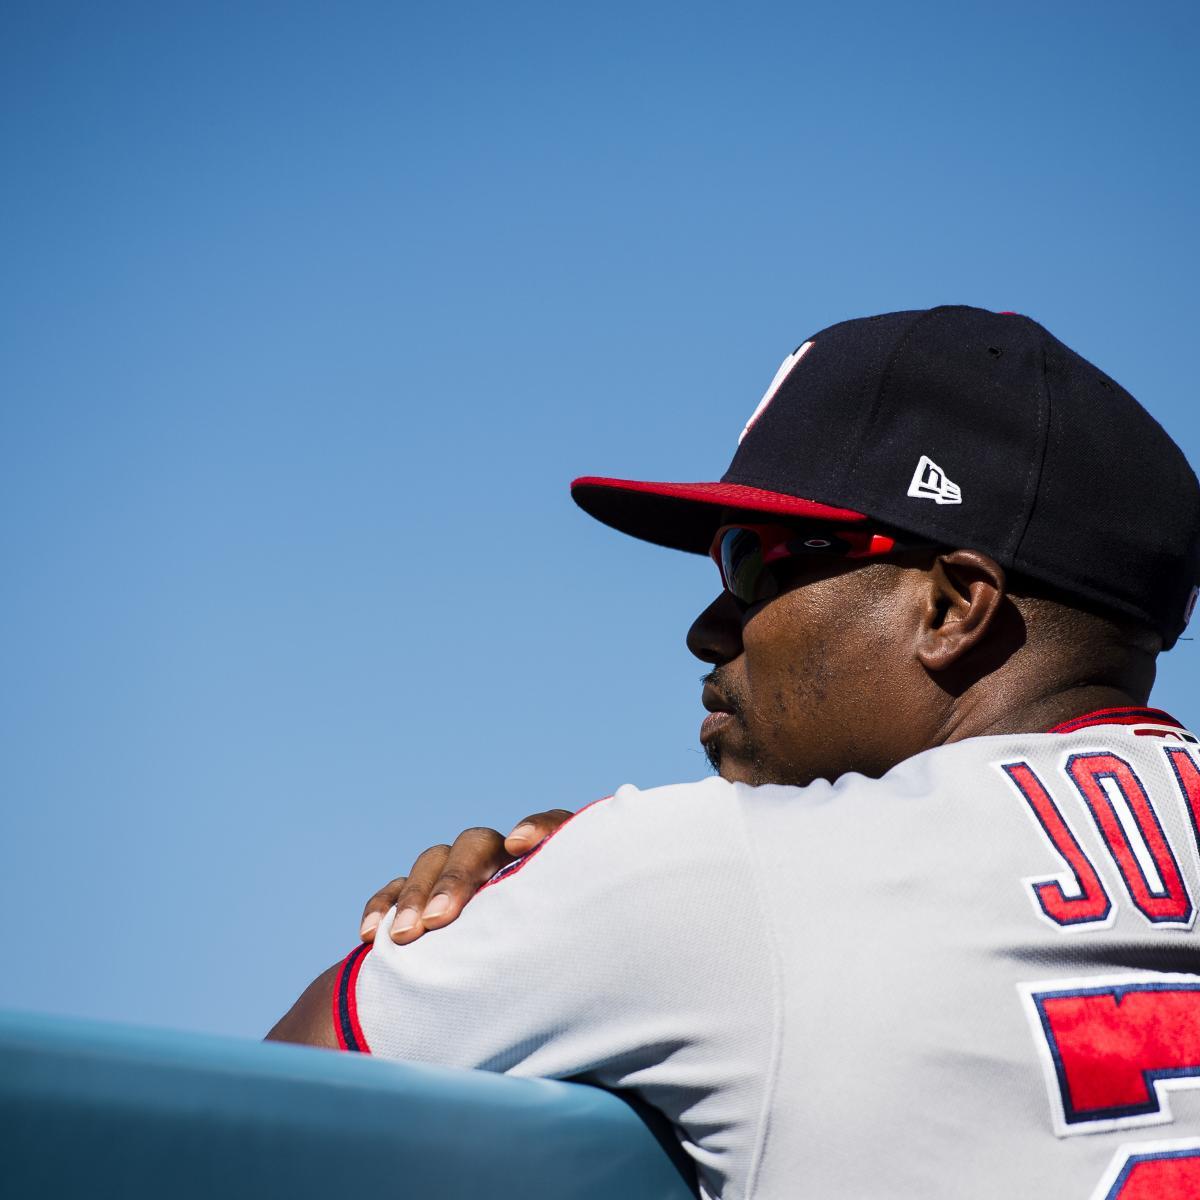 Jacque Jones suspended: Nationals assistant hitting coach